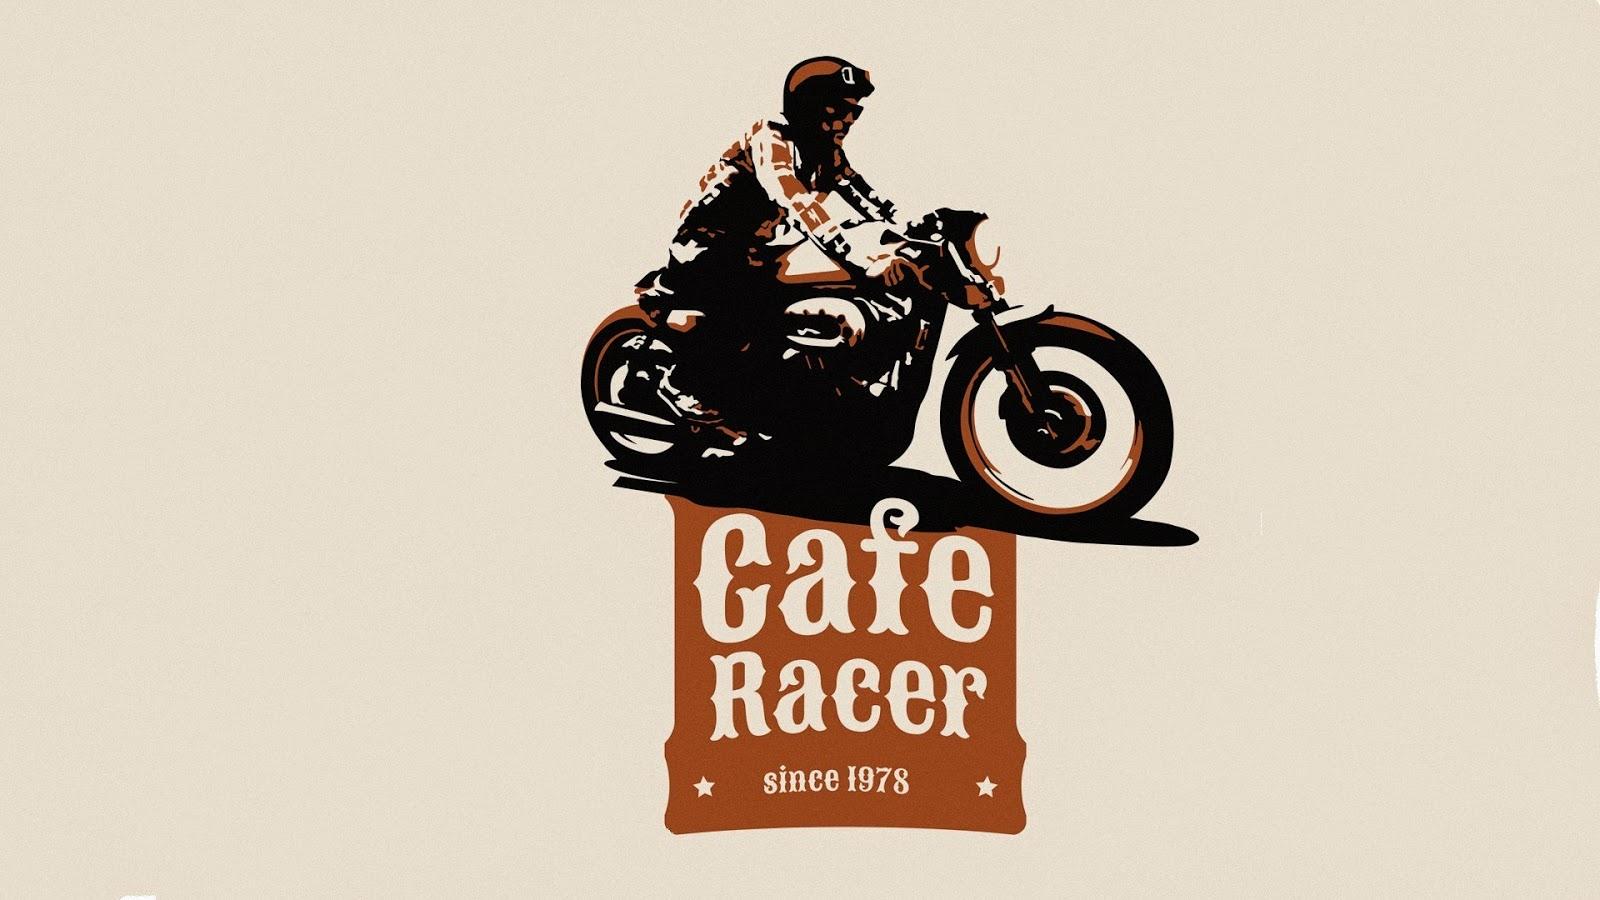 cafe hd wallpaper - photo #18